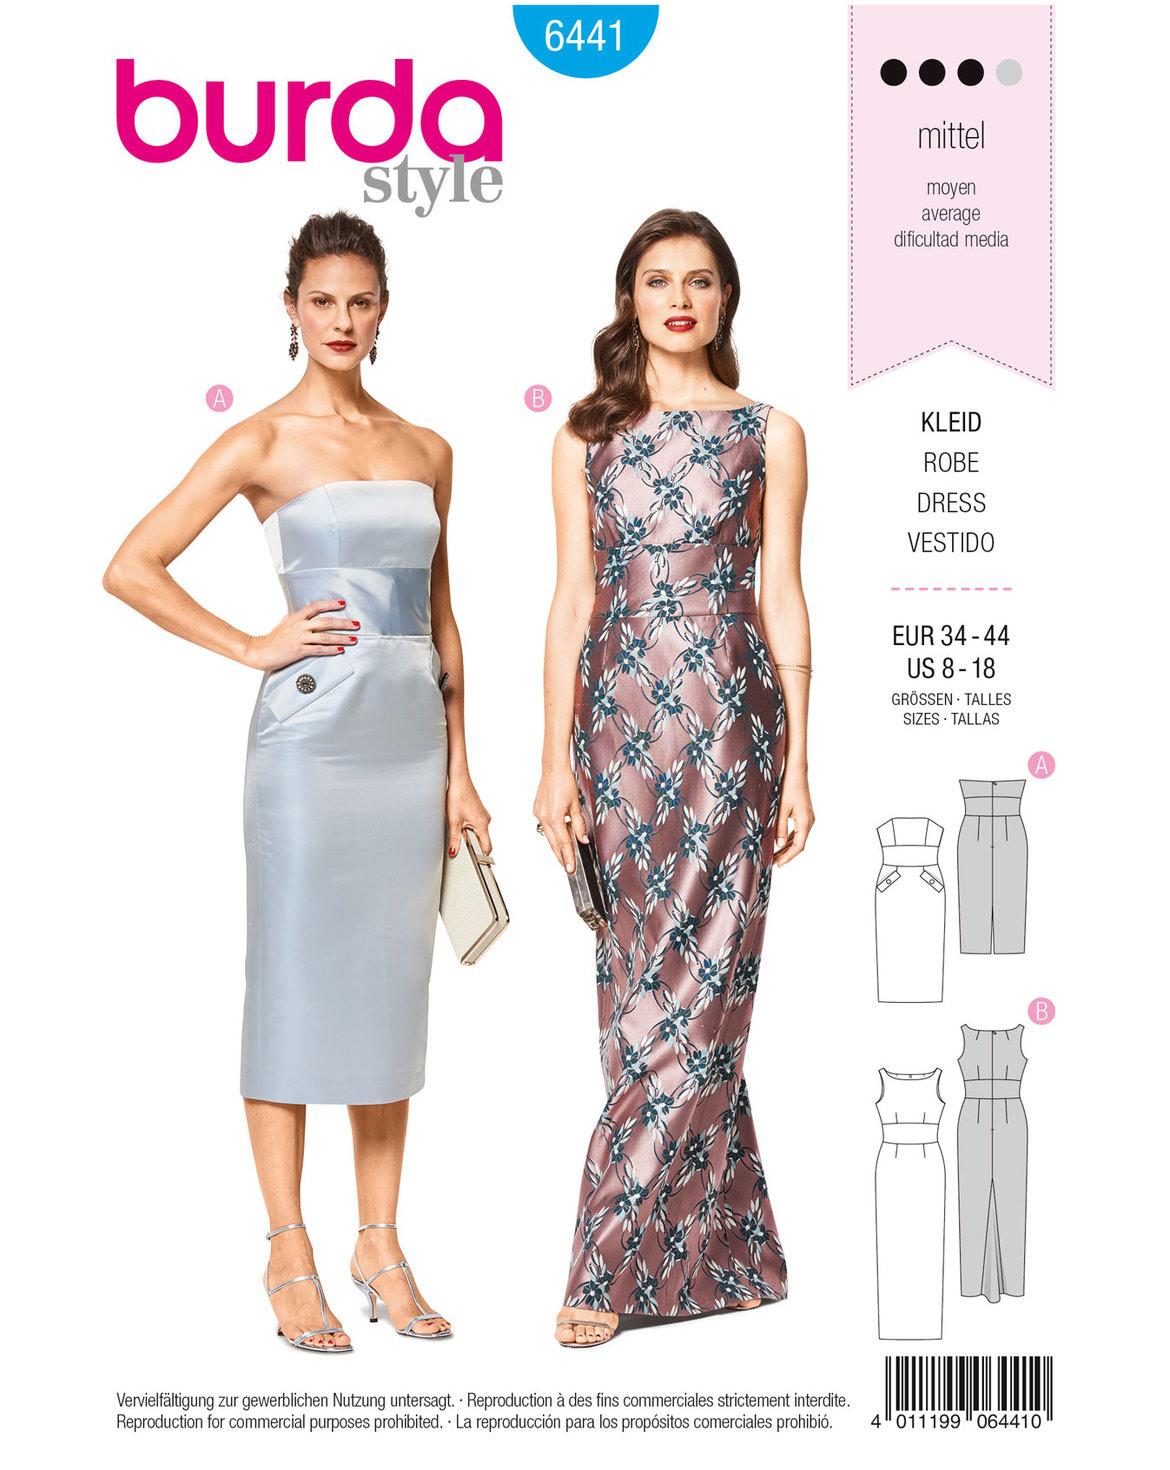 17 Elegant Abendkleid Nähen Schnittmuster StylishAbend Fantastisch Abendkleid Nähen Schnittmuster Boutique